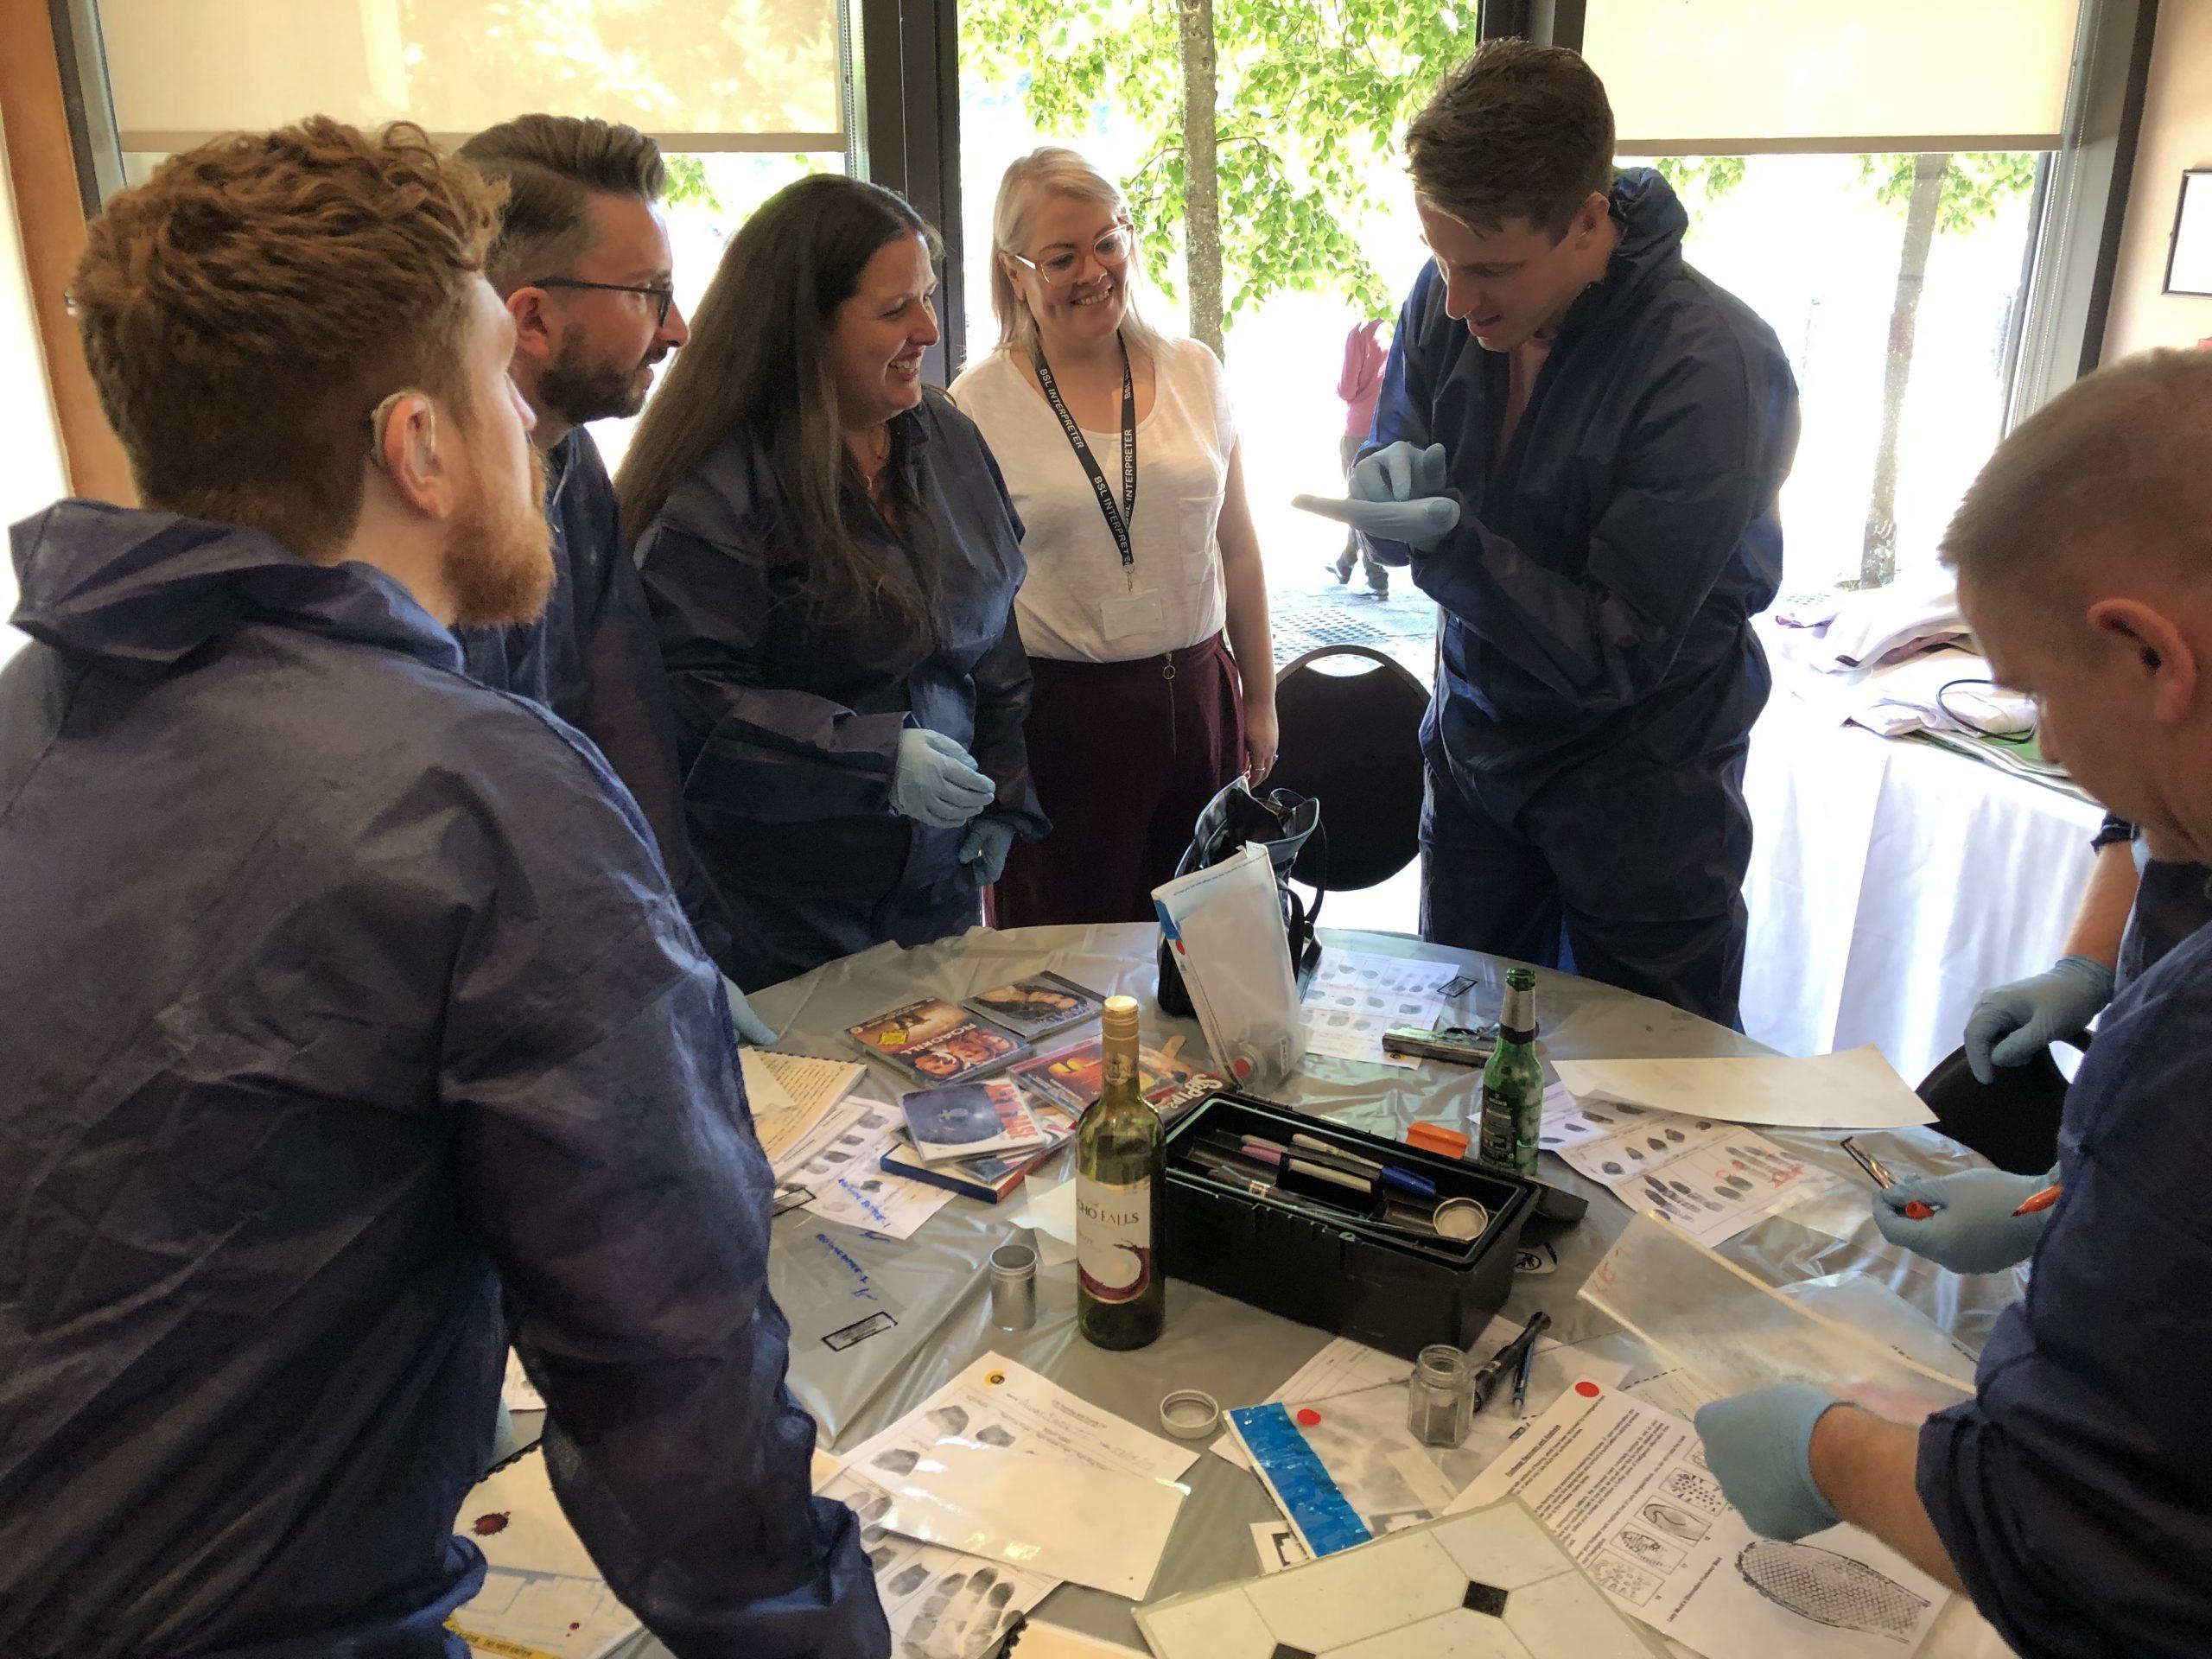 CSI Training and Events - ITV signpost Delegates examining items at a CSI team building event